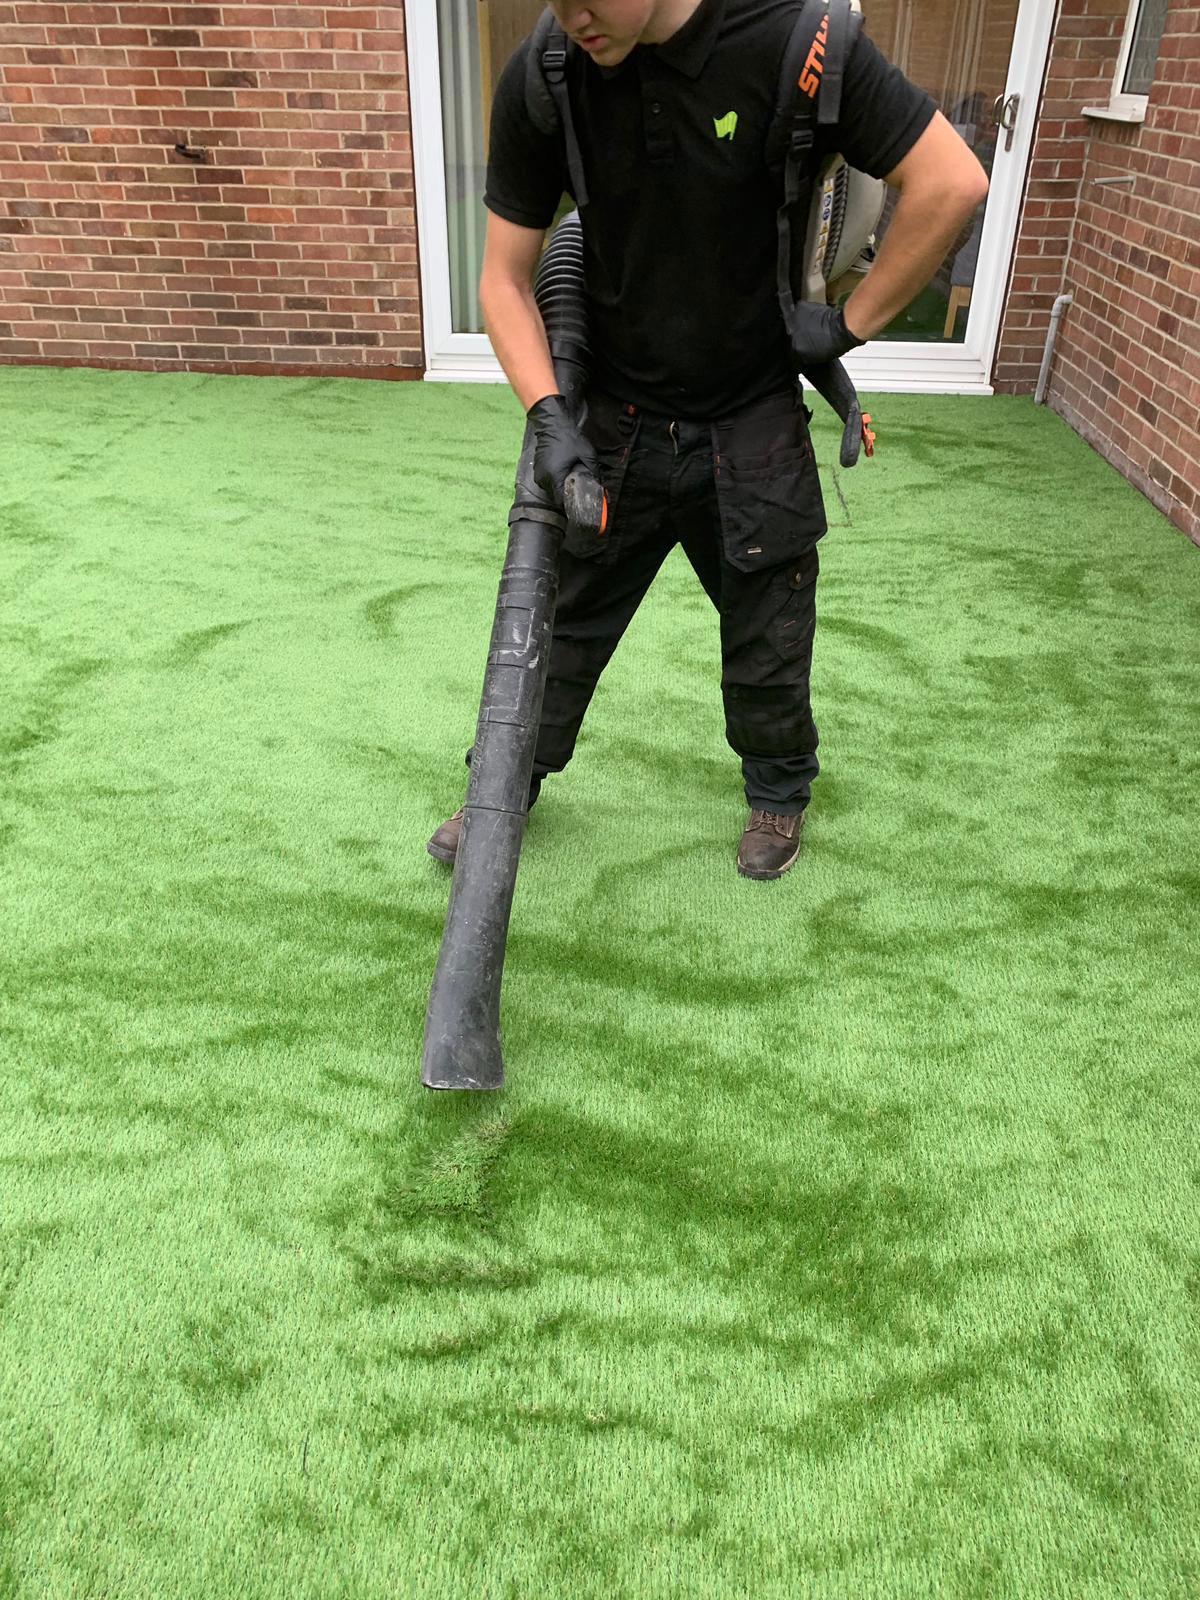 Fake Grass for Dogs Runcorn Artificial Super Grass